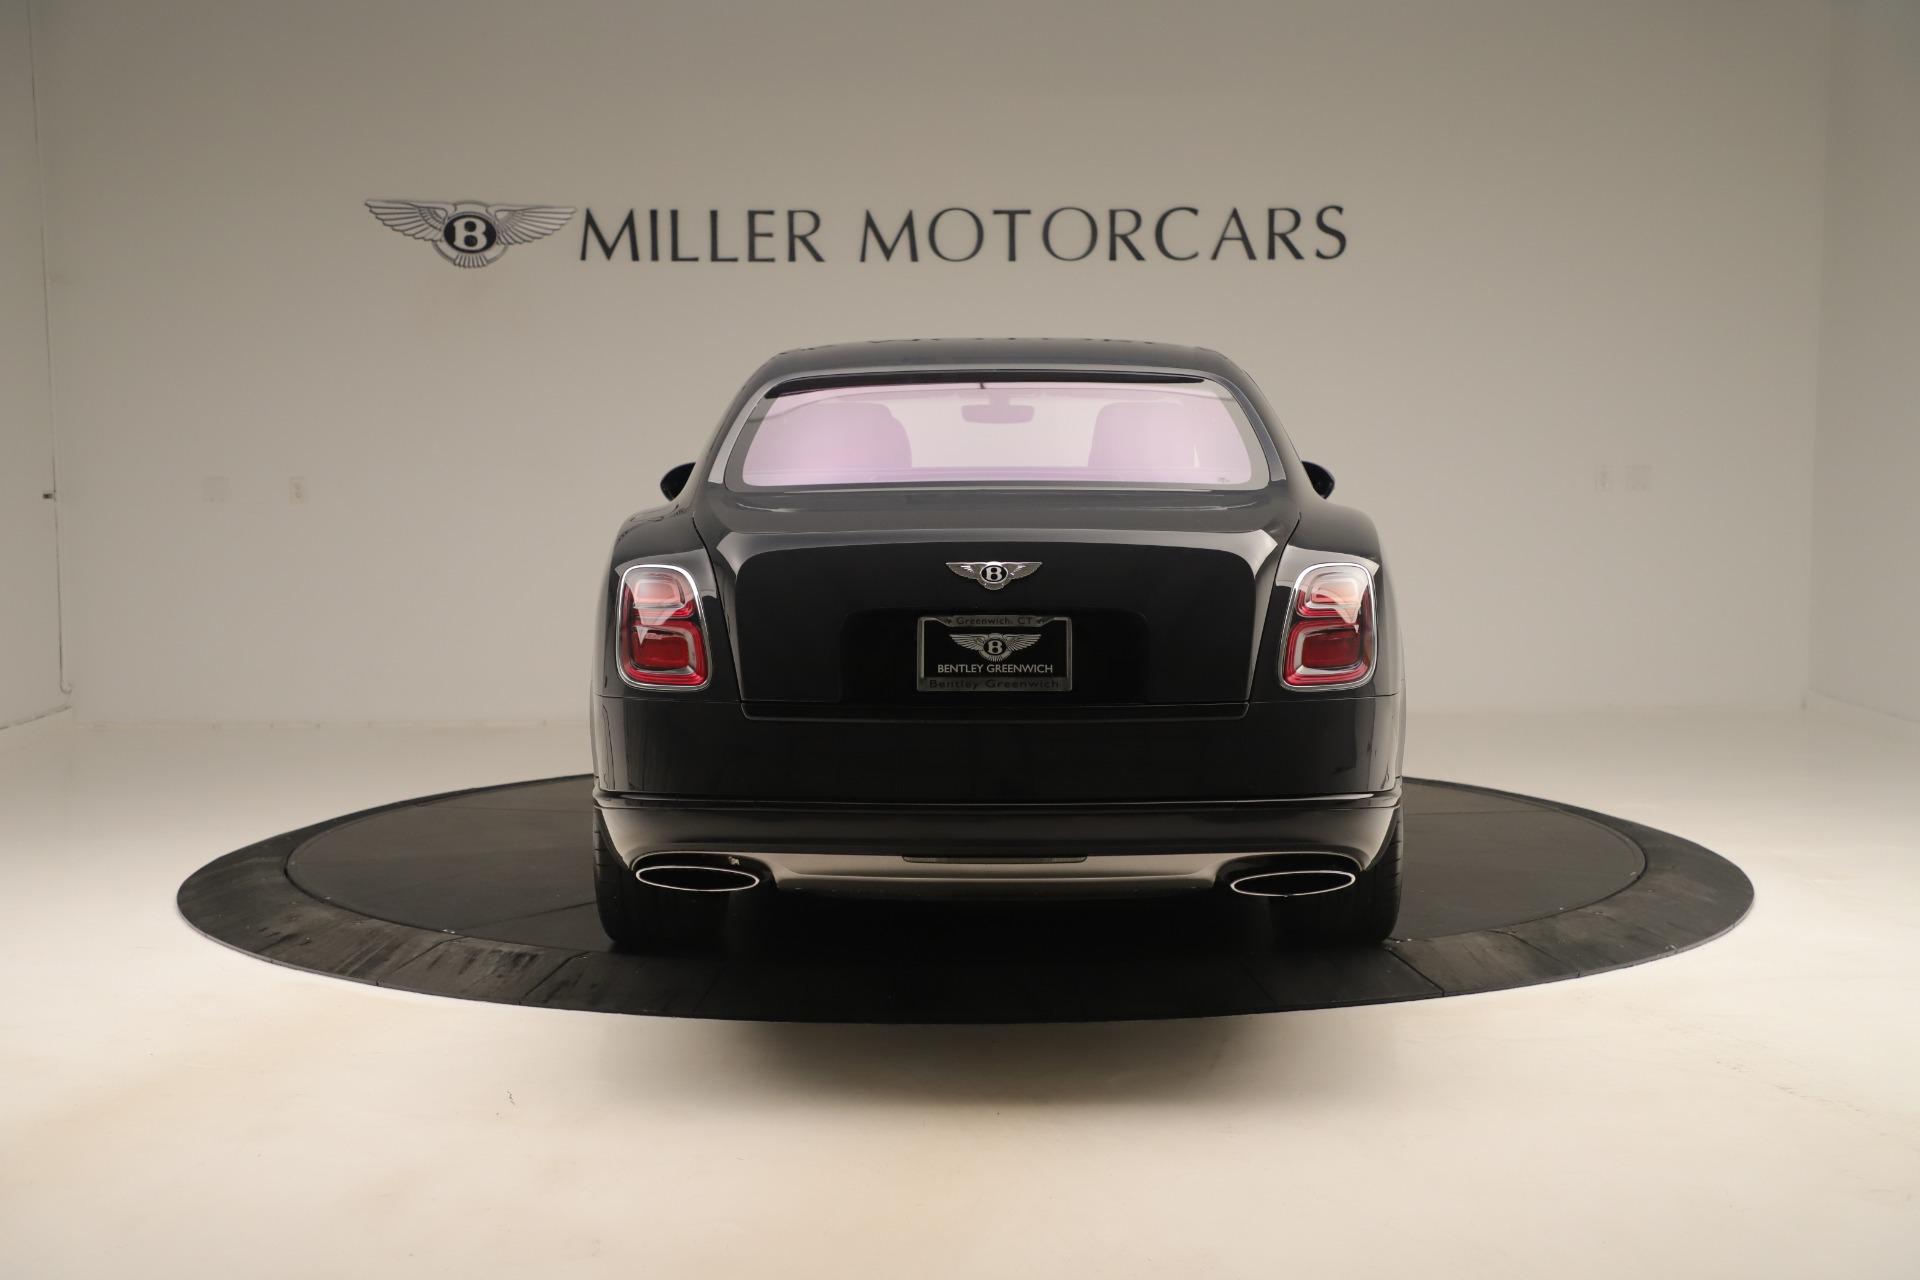 Used 2018 Bentley Mulsanne Speed Design Series For Sale In Westport, CT 3405_p6